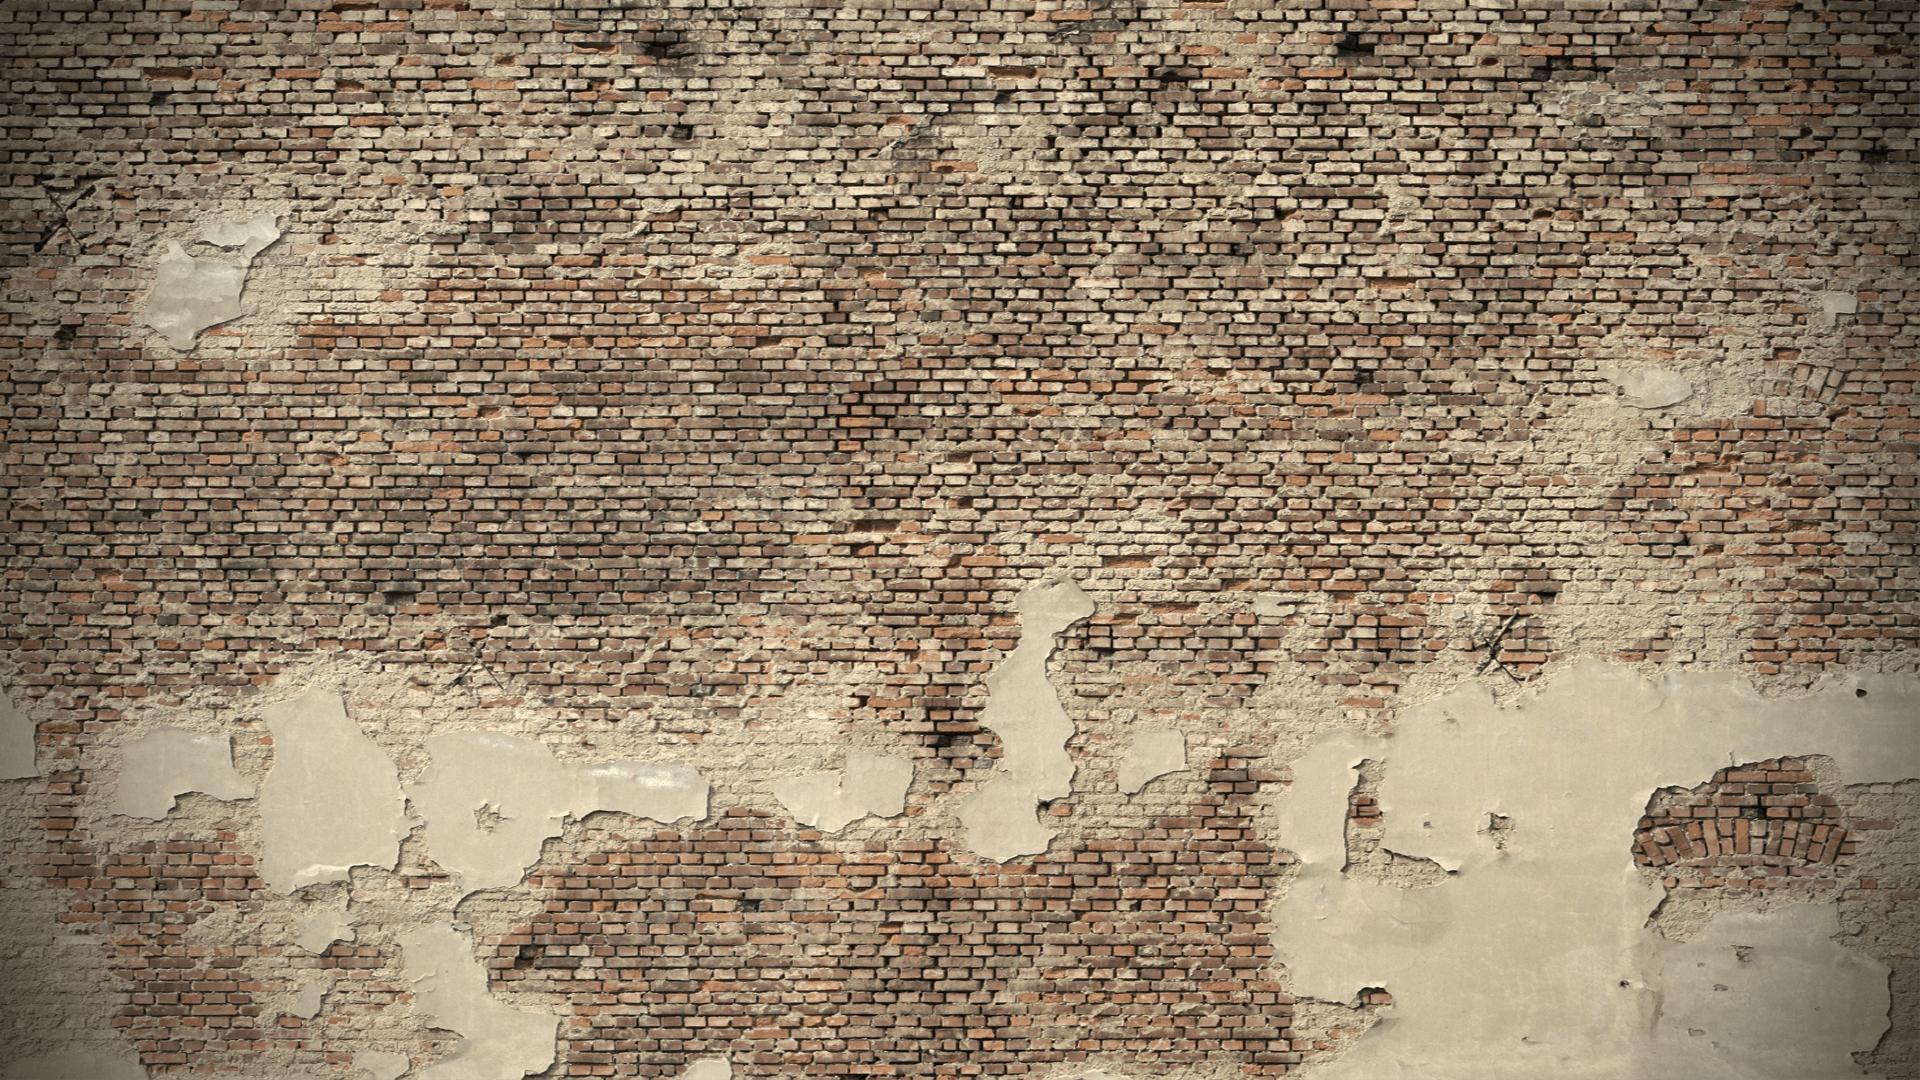 4k brick wall